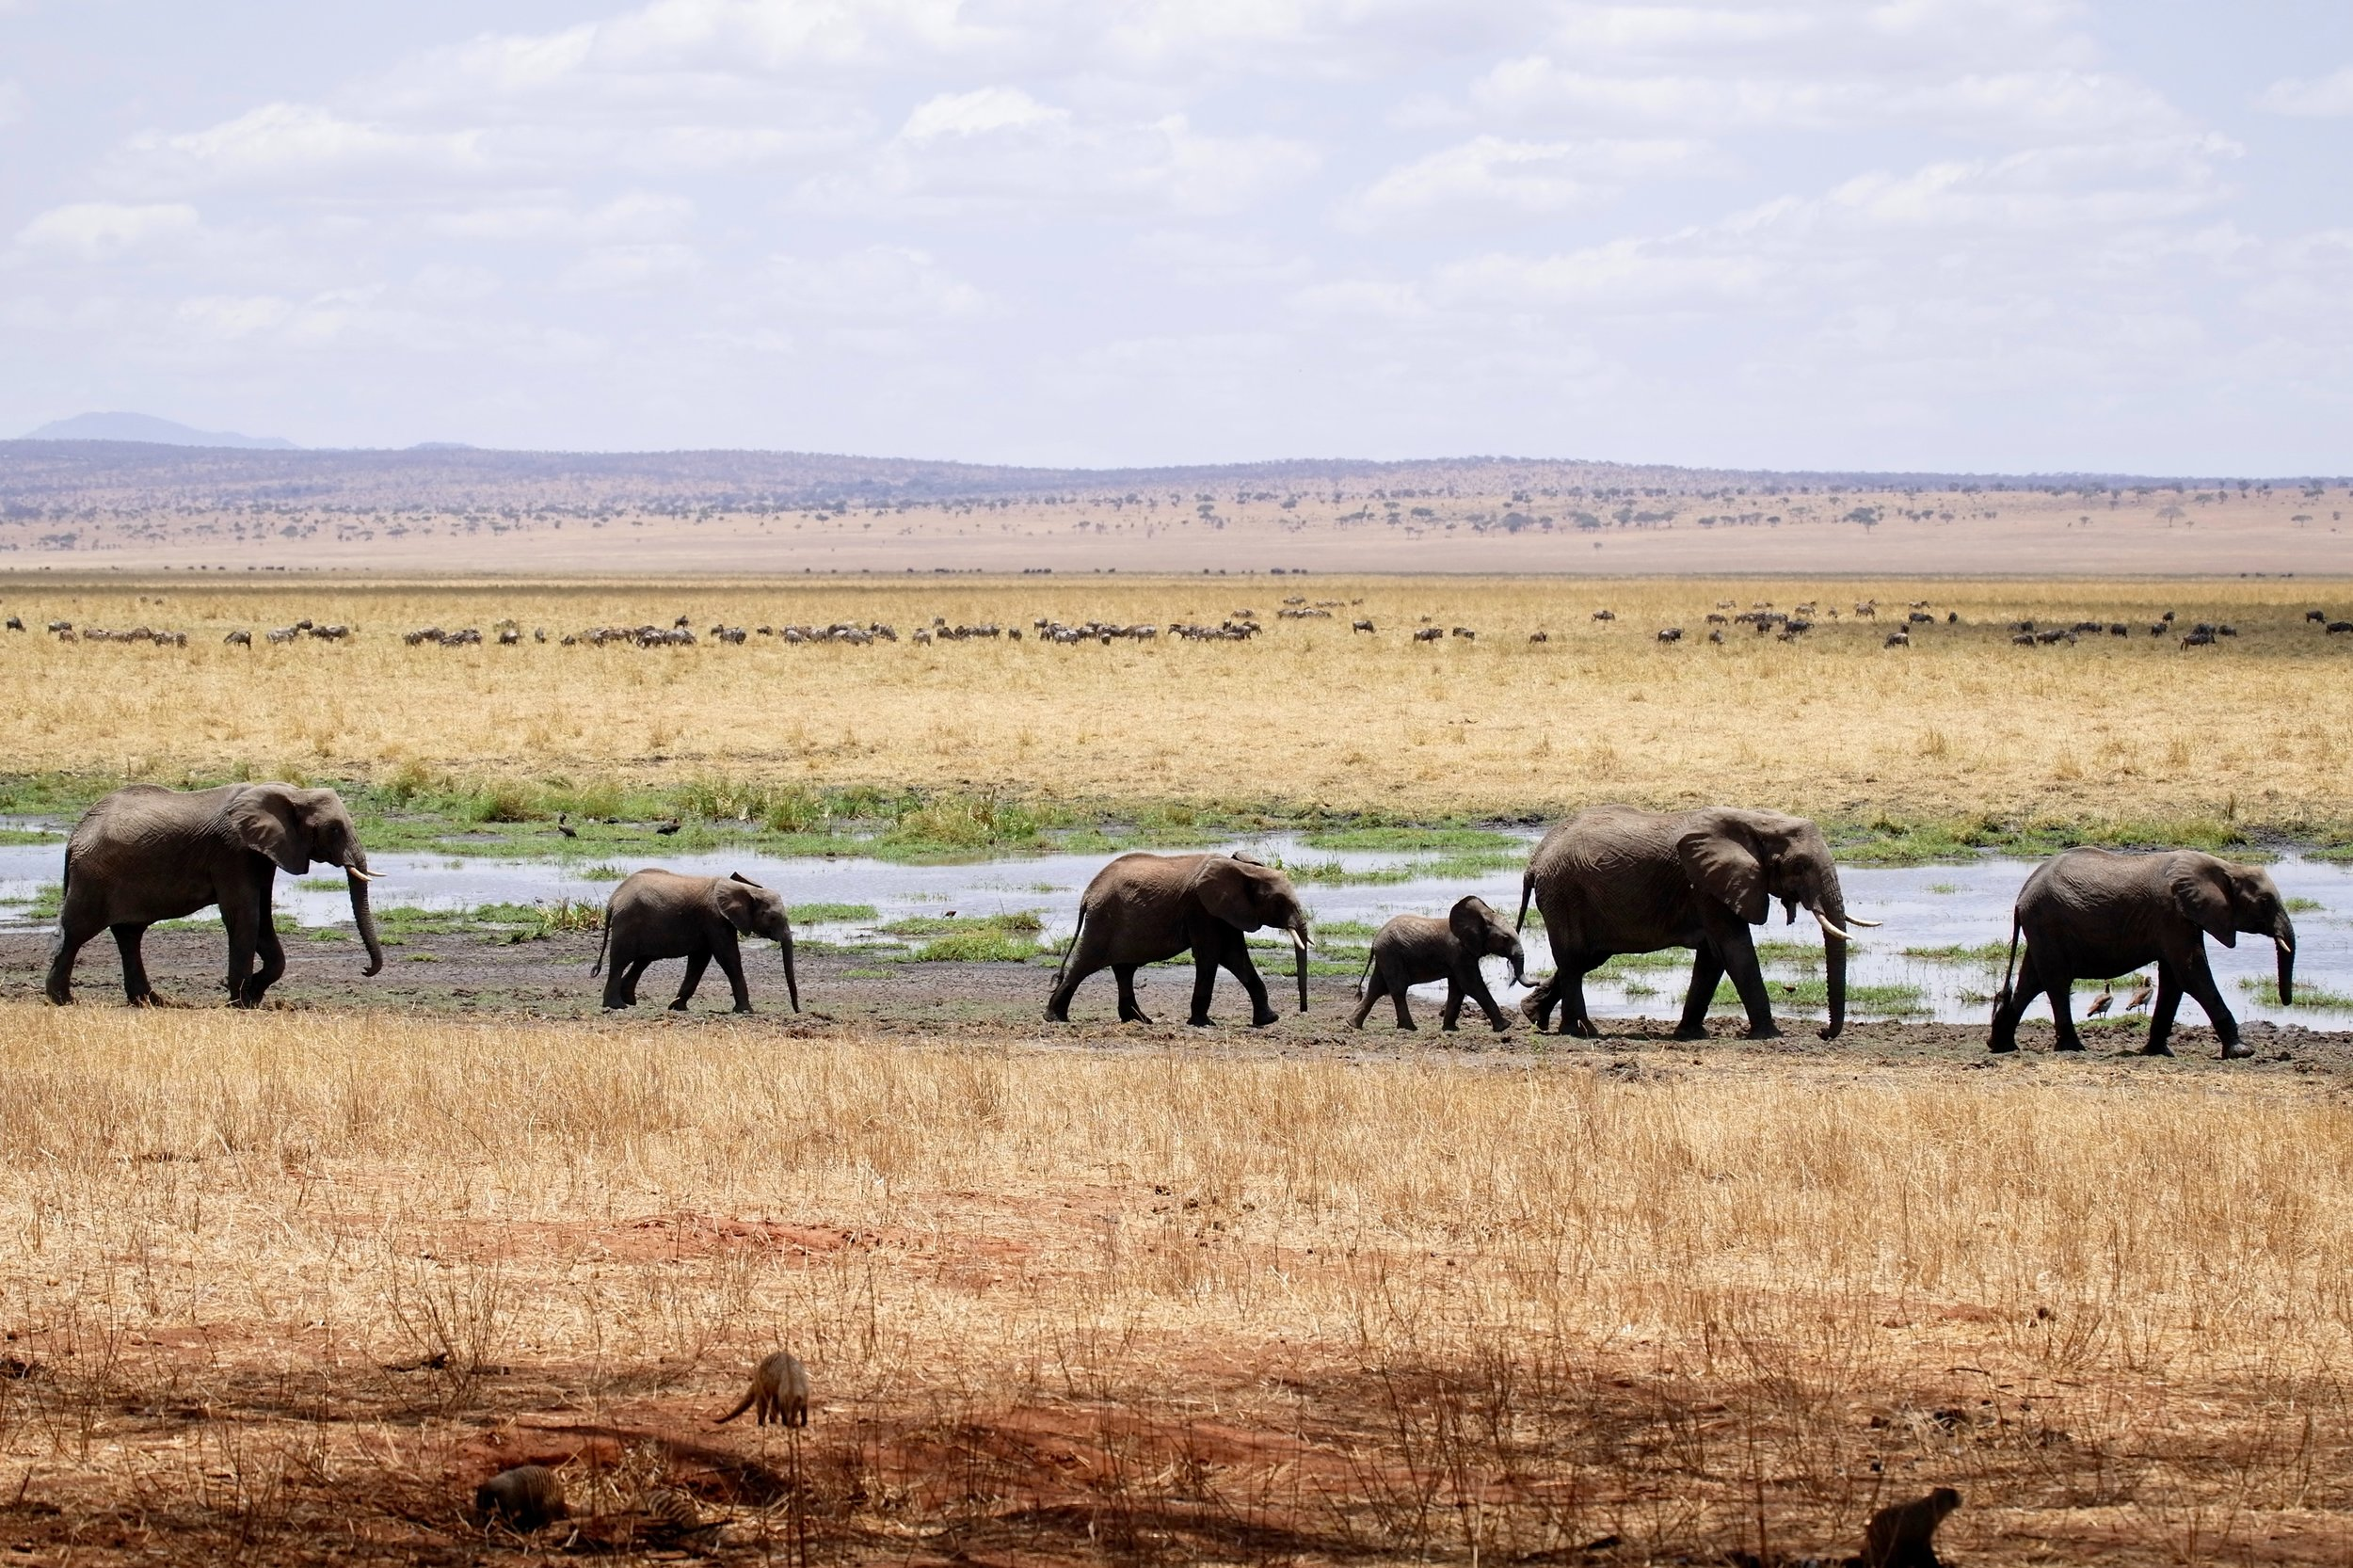 Tarangire National Park, Arusha, Tanzania Photo by  ray rui  on  Unsplash